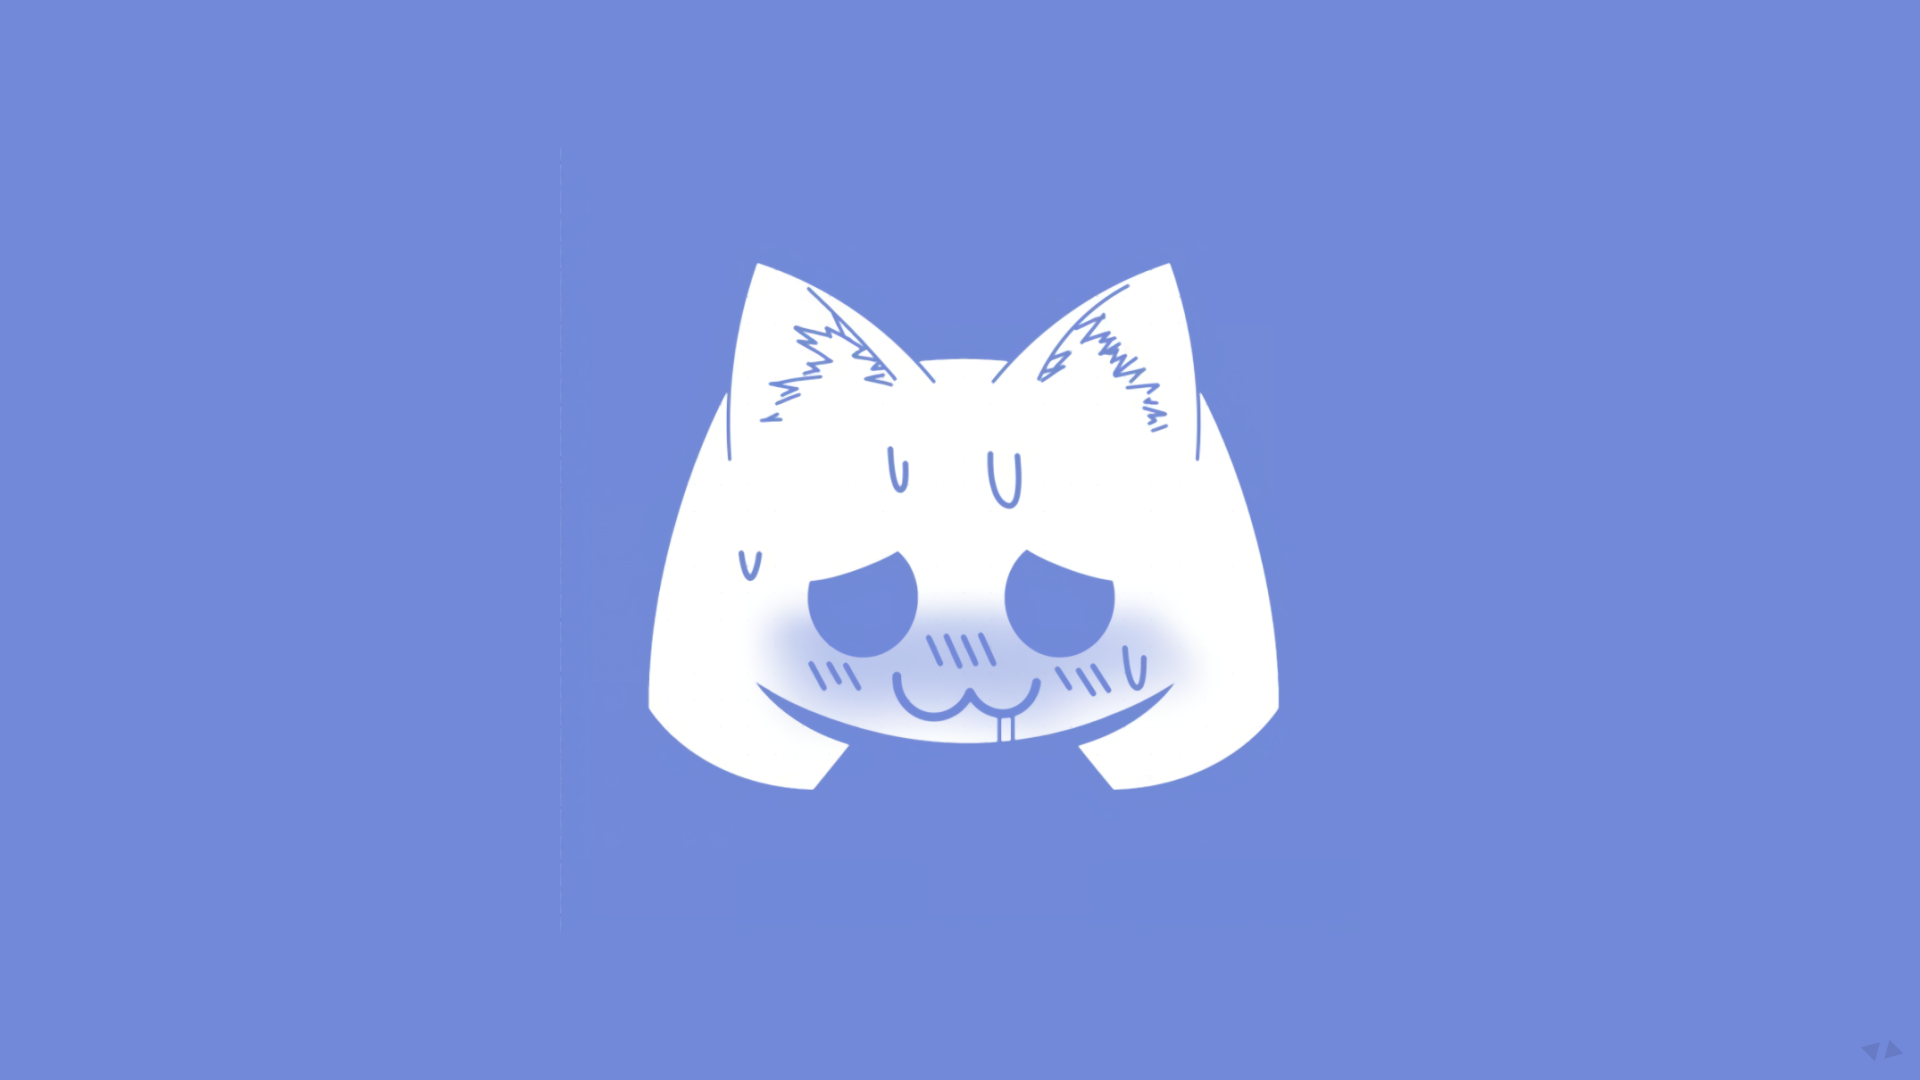 Logo Discord Digital Art Cat Ears Simple Background Blue White Sweat 1080p Wallpaper Hdwallpaper Desk Digital Art Software Simple Backgrounds Art Blog